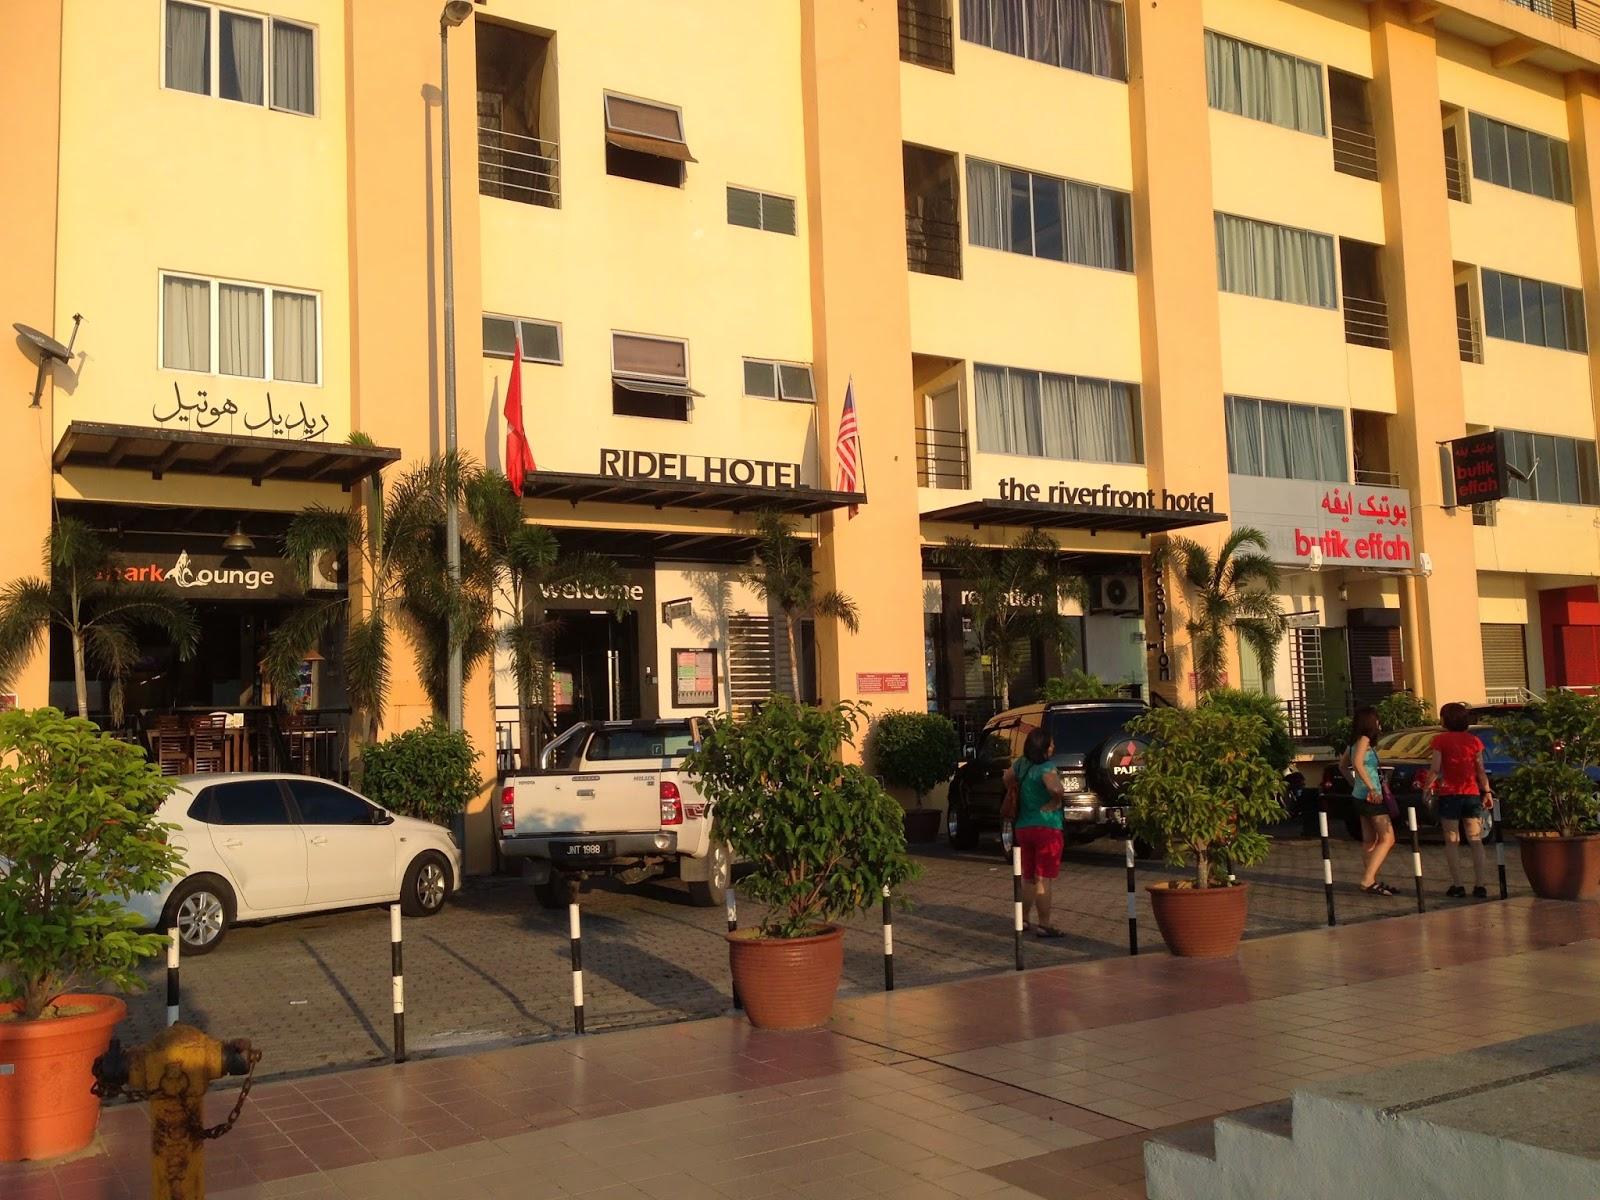 Rider Hotel facade